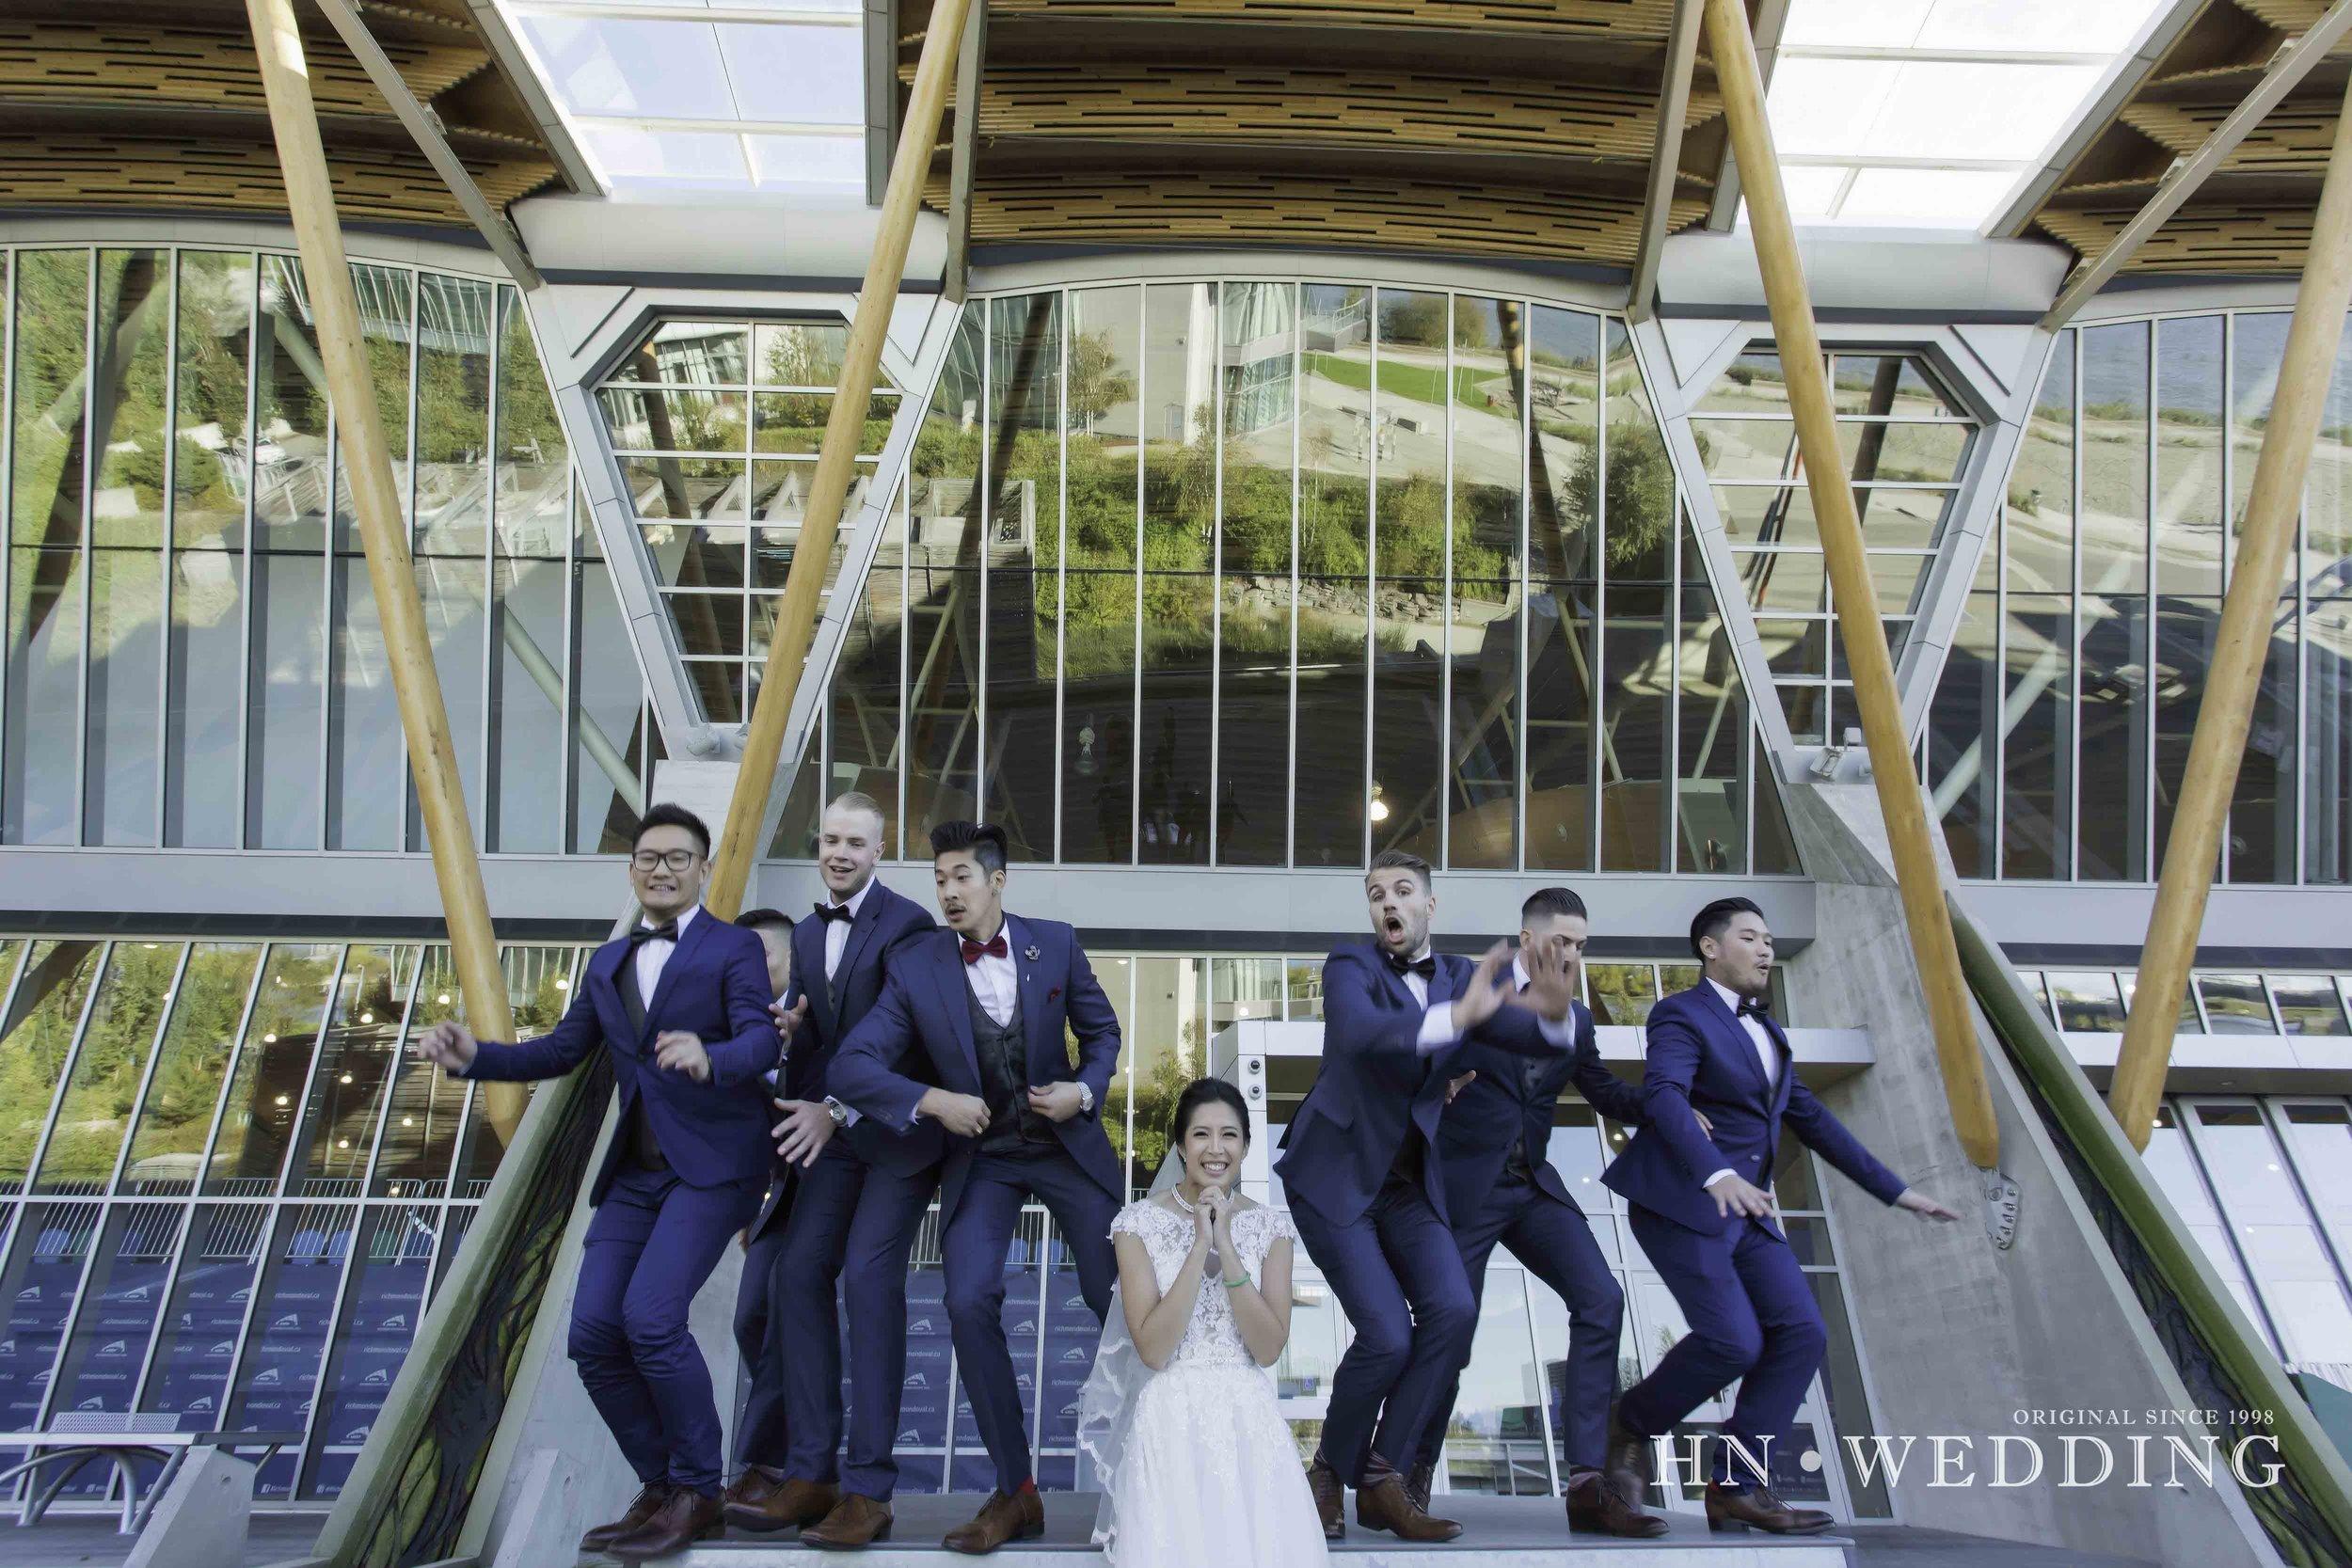 HNwedding-20160815-wedding-025.jpg